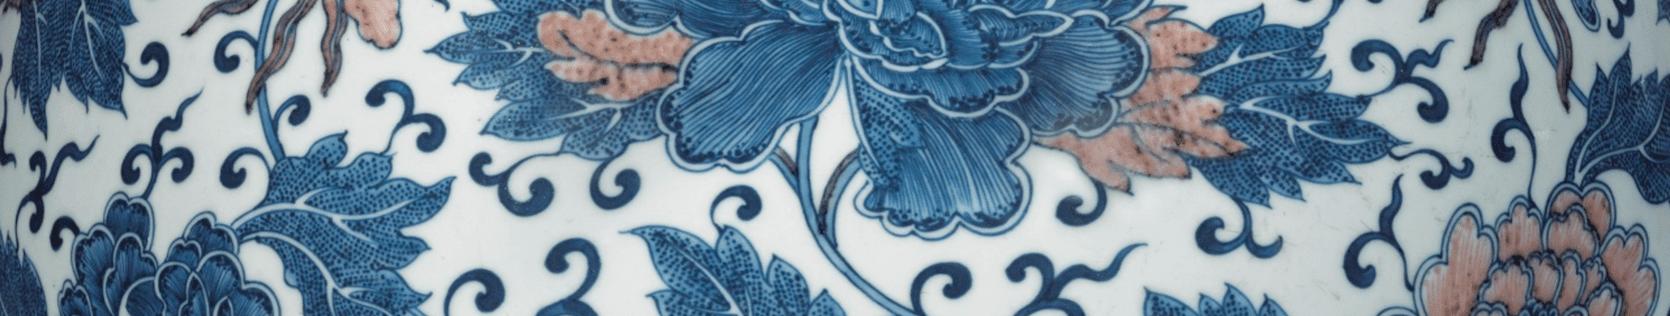 antique porcelain vases